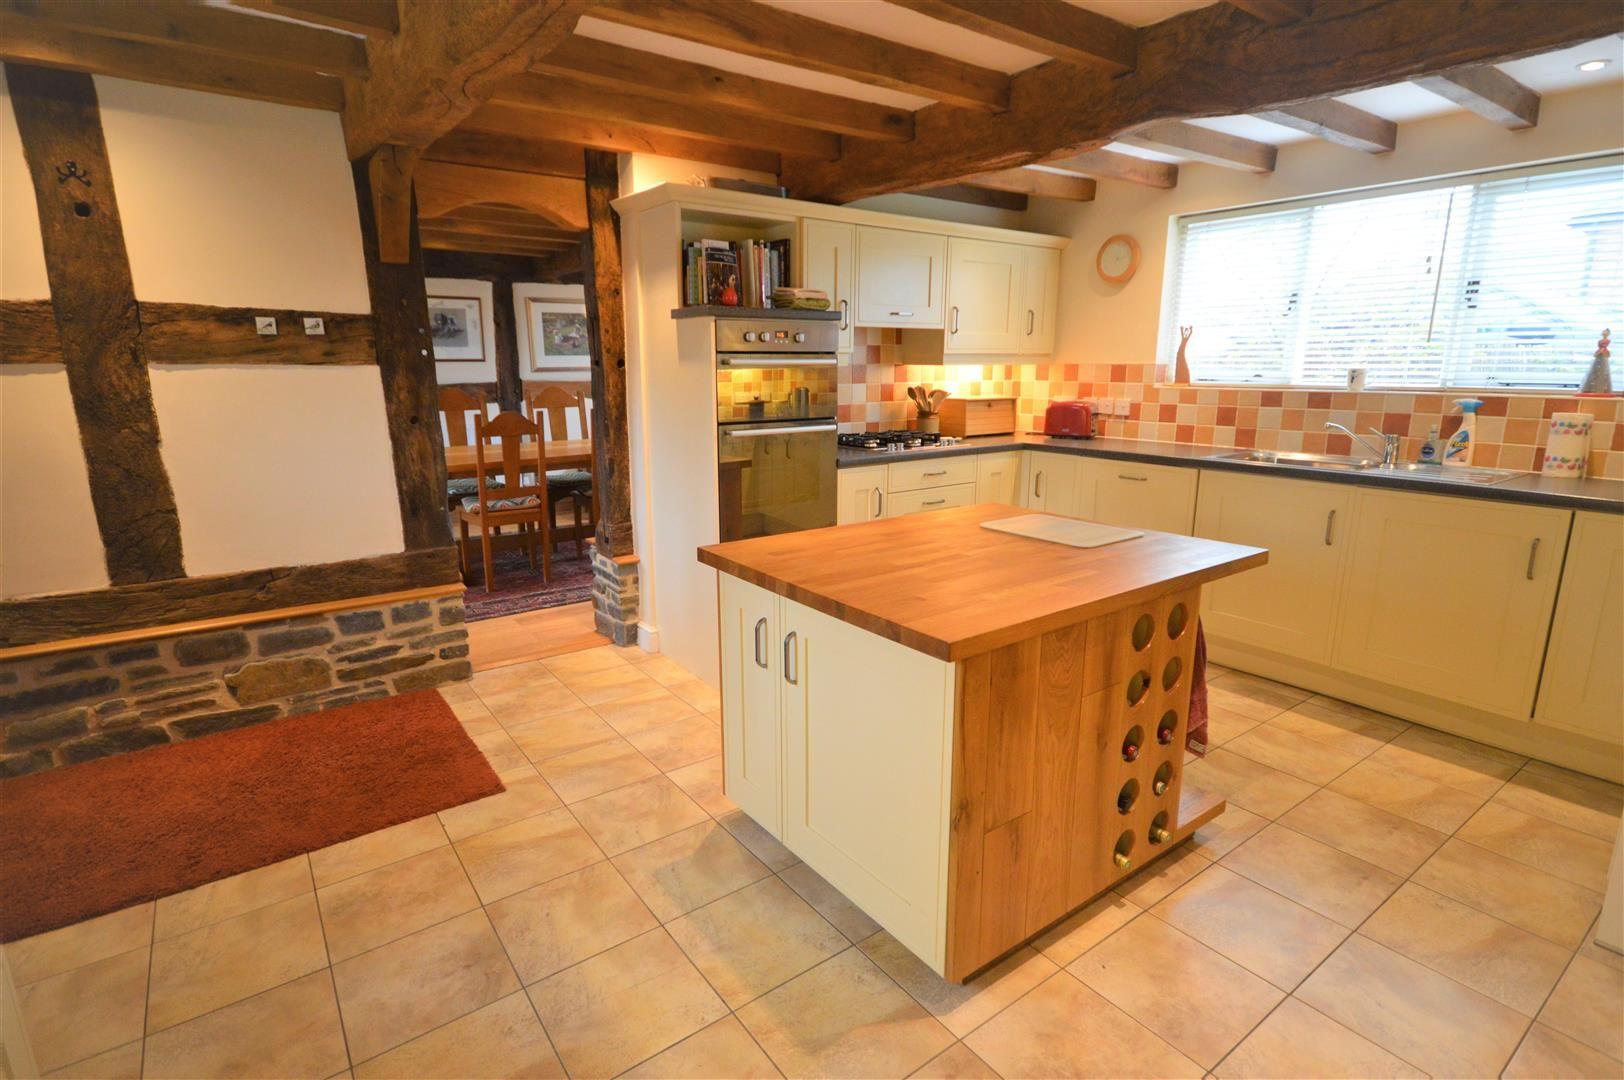 4 bed barn conversion for sale in Kingsland  - Property Image 5